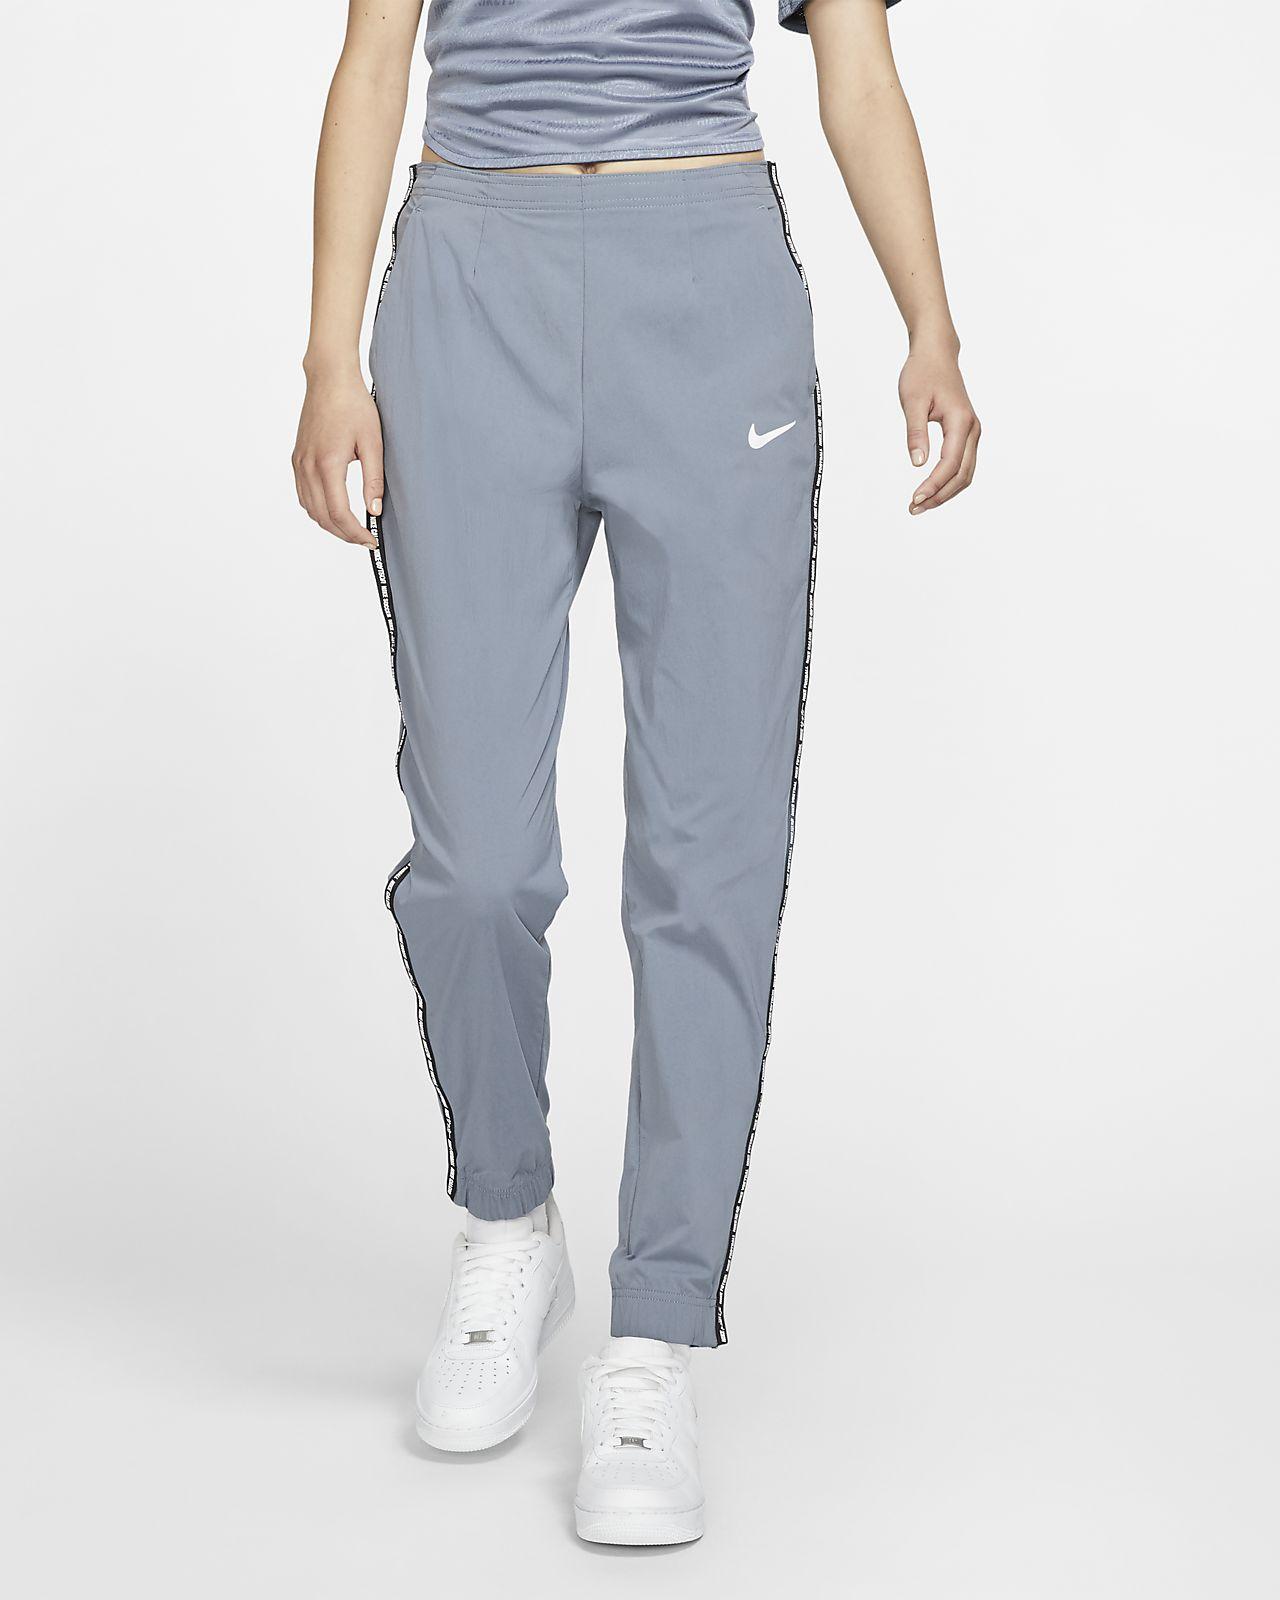 Nike F.C. Women's Soccer Pants